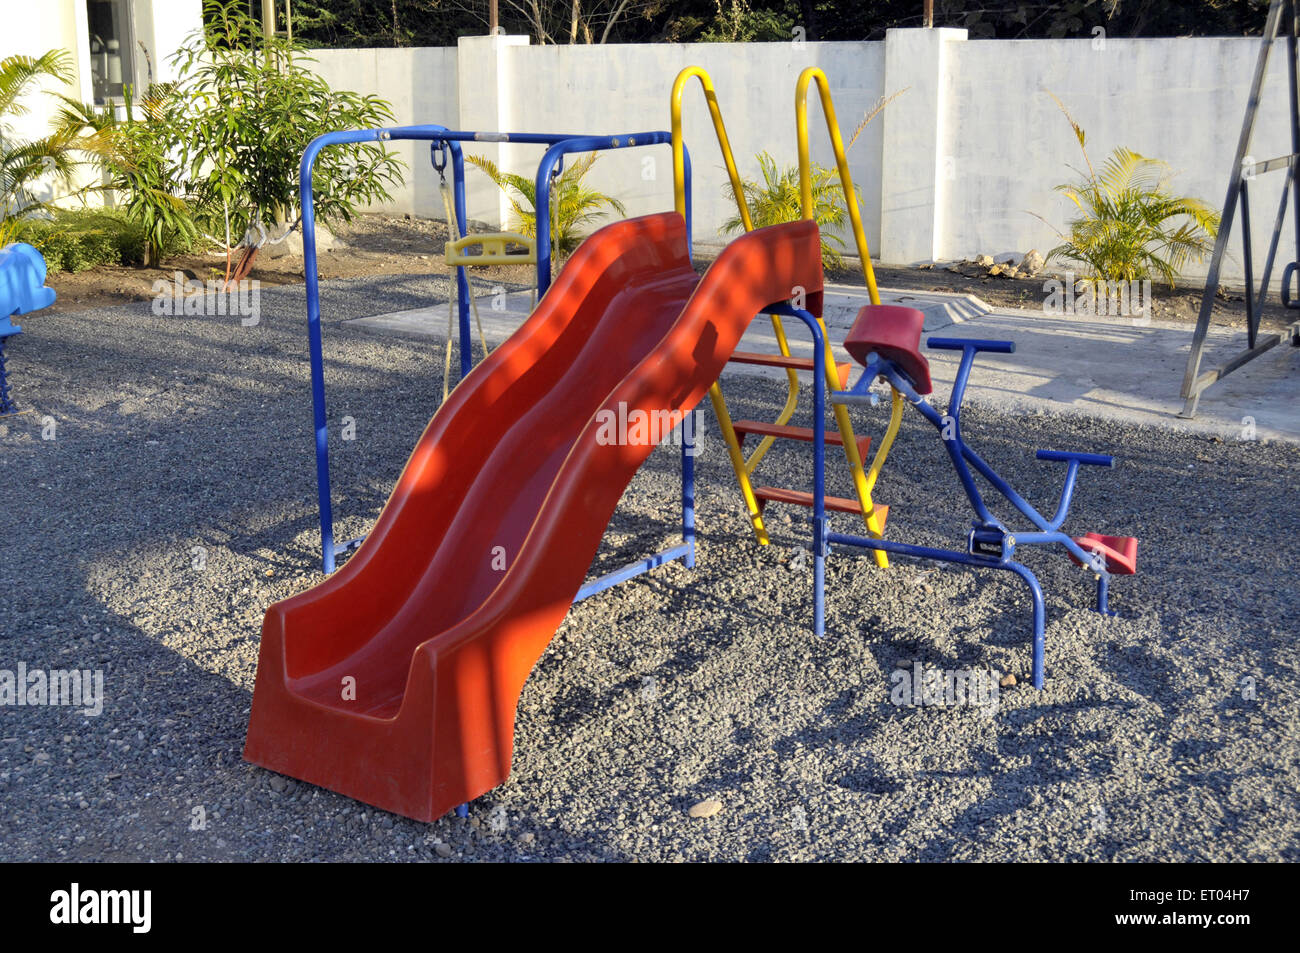 Diapositiva de playground Gir en Gujarat, India Imagen De Stock